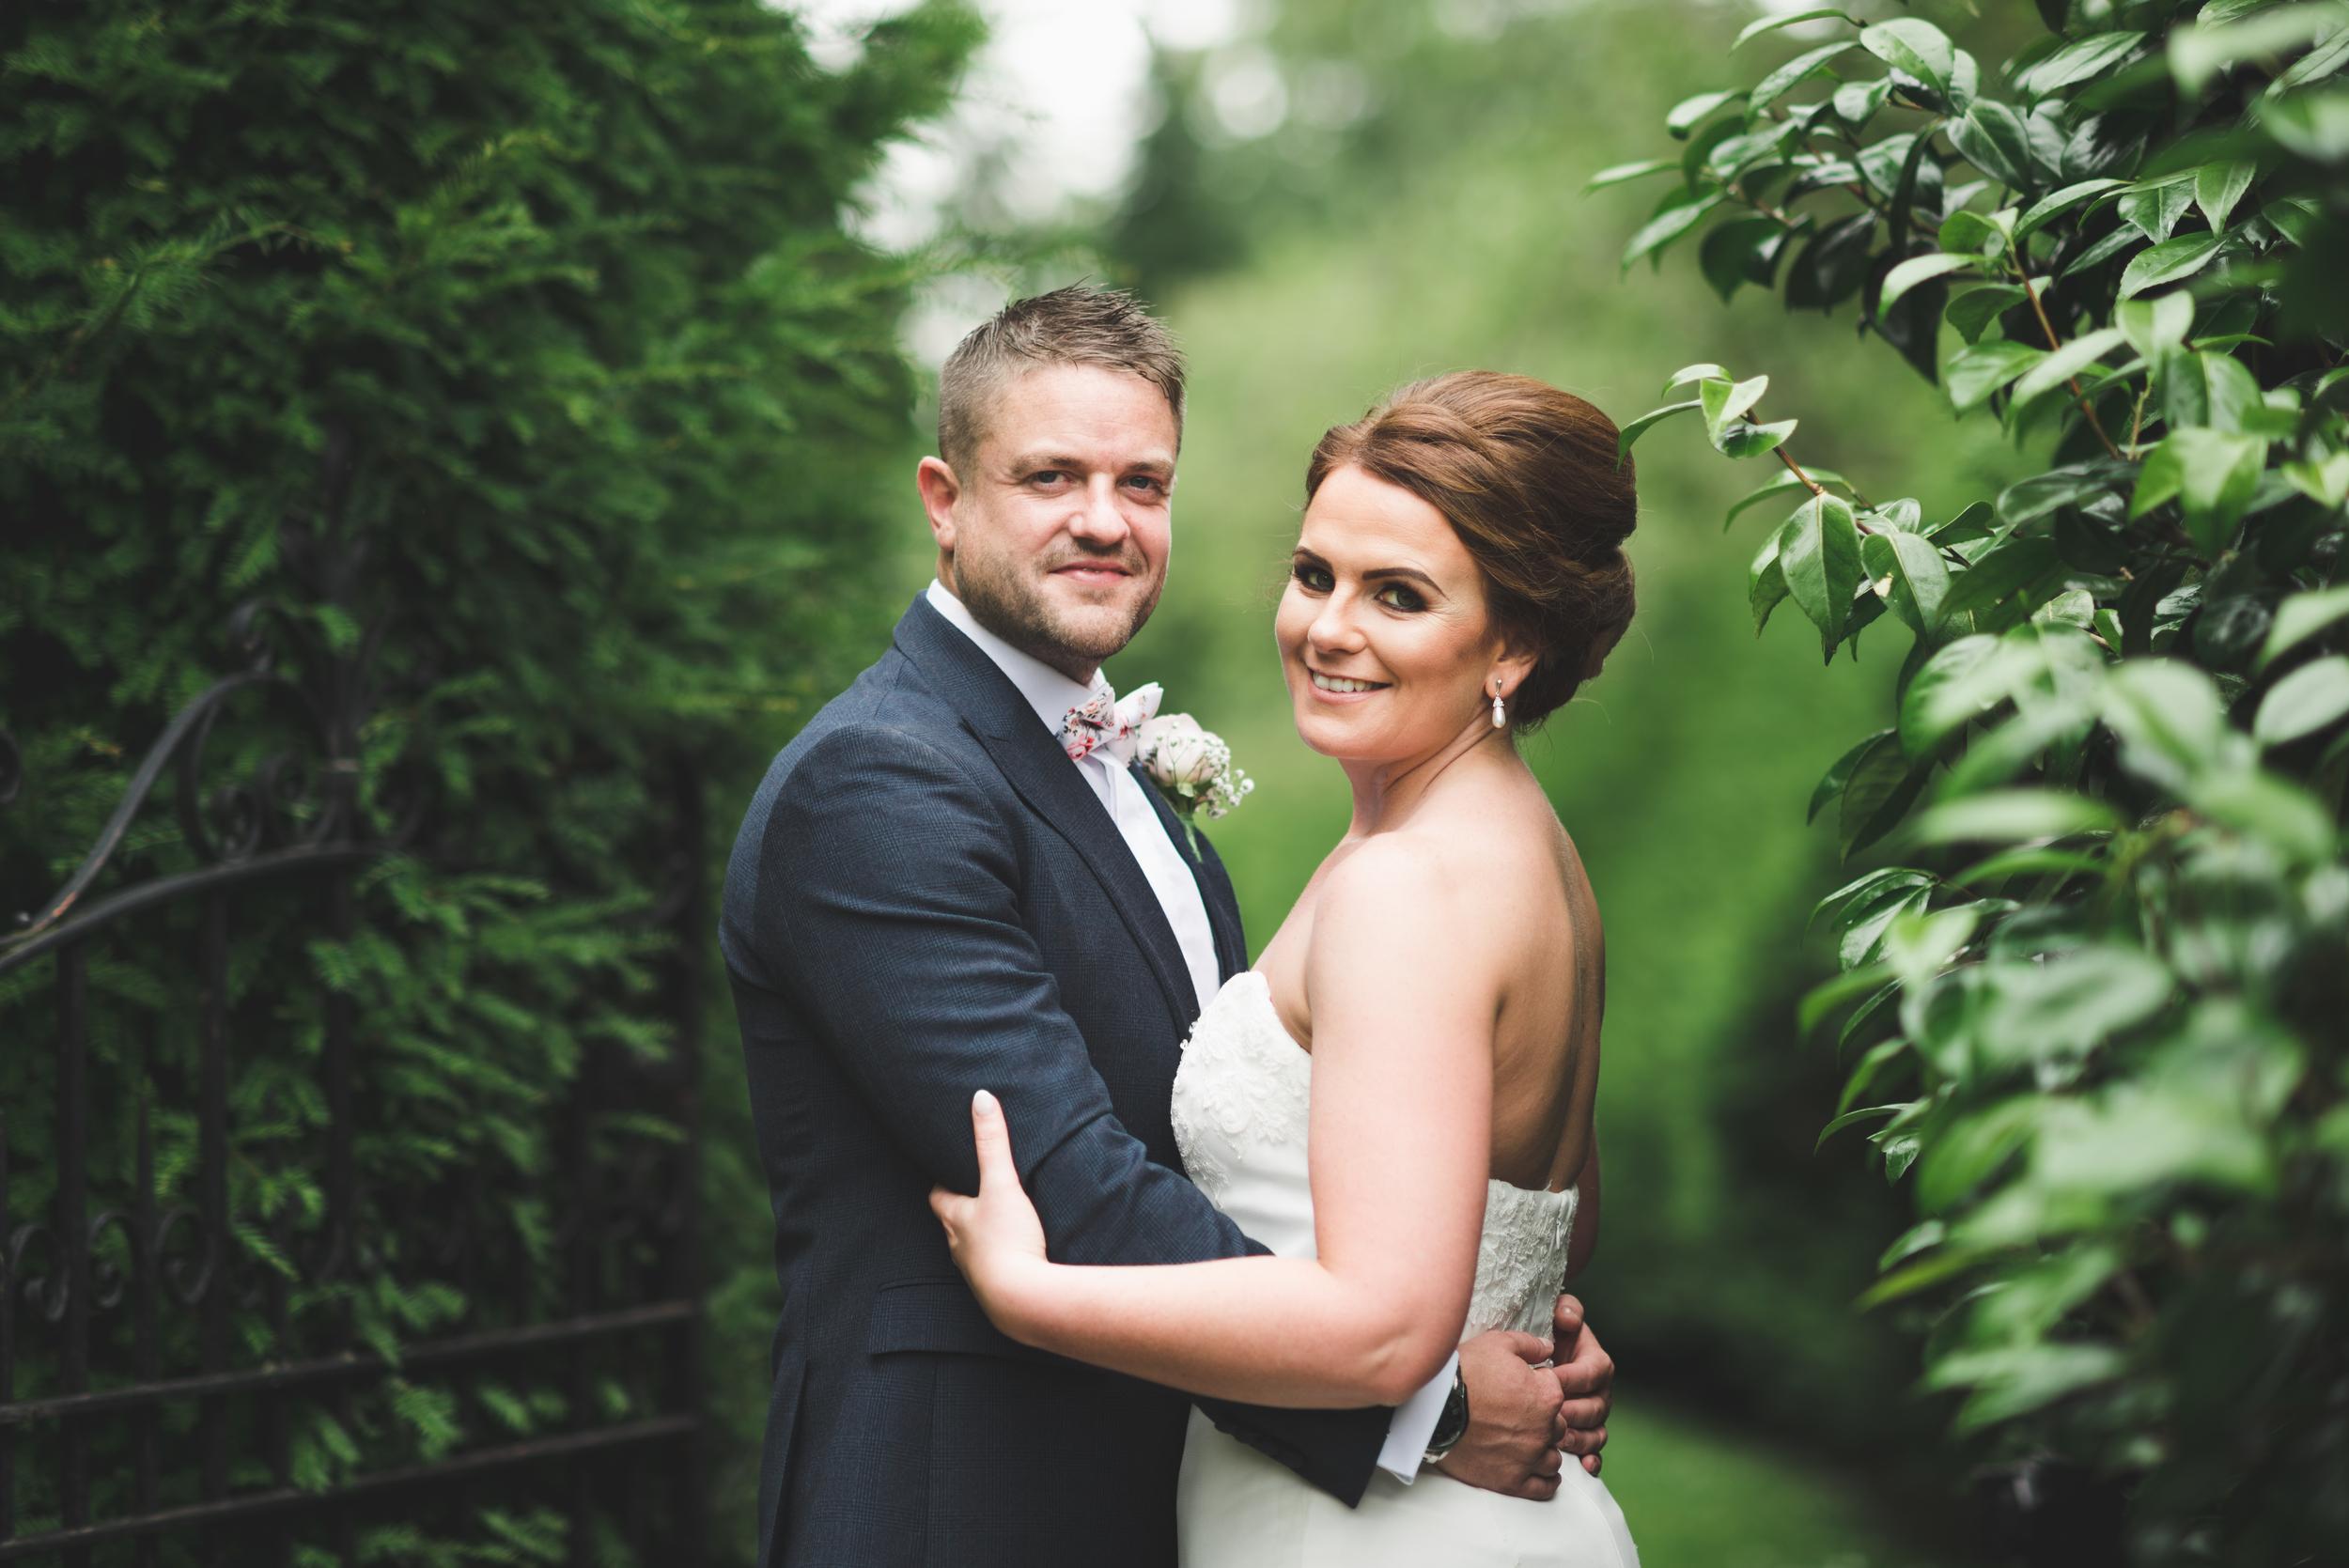 Northern Ireland Wedding Photographer purephotoni Sir Thomas and lady dixons park bride groom portrait